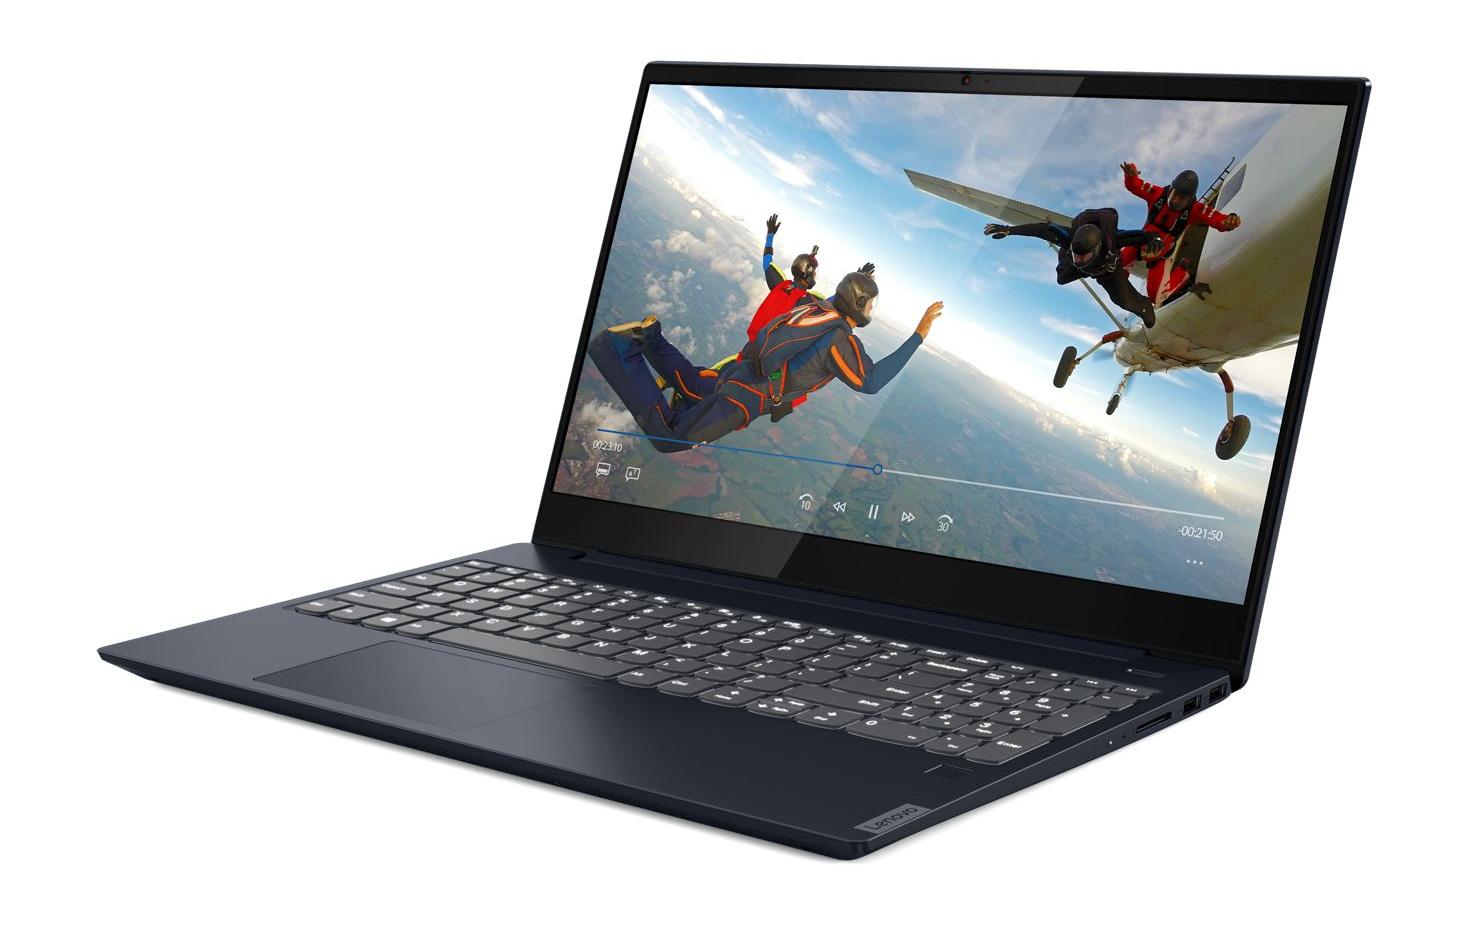 "PC Portable 15.6"" Lenovo Ideapad S340-15API-003 - Full HD, Ryzen 5 3500U, RAM 4 Go, SSD 256 Go, Windows 10S"